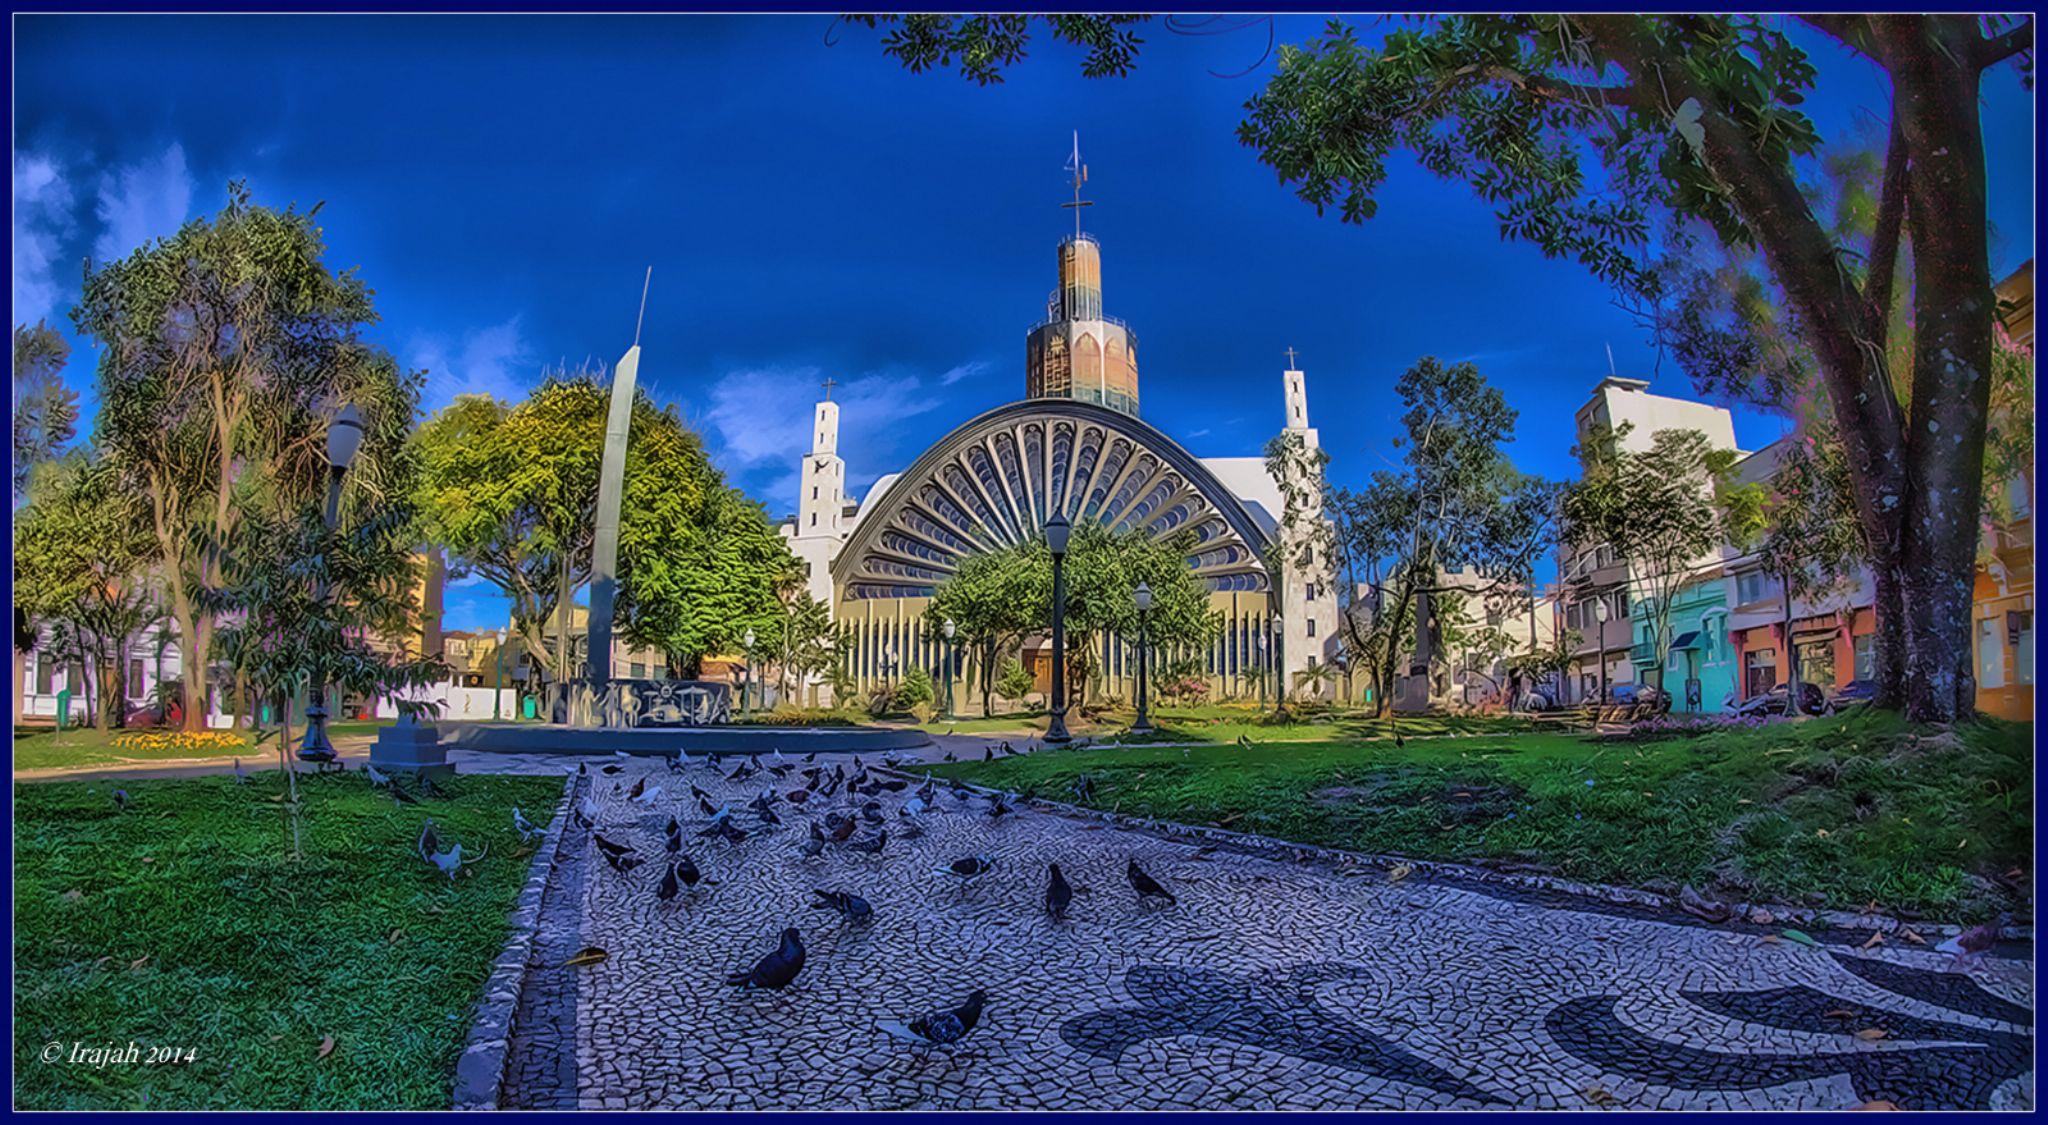 Catedral Ponta Grossa Parana Brazil by Irajah